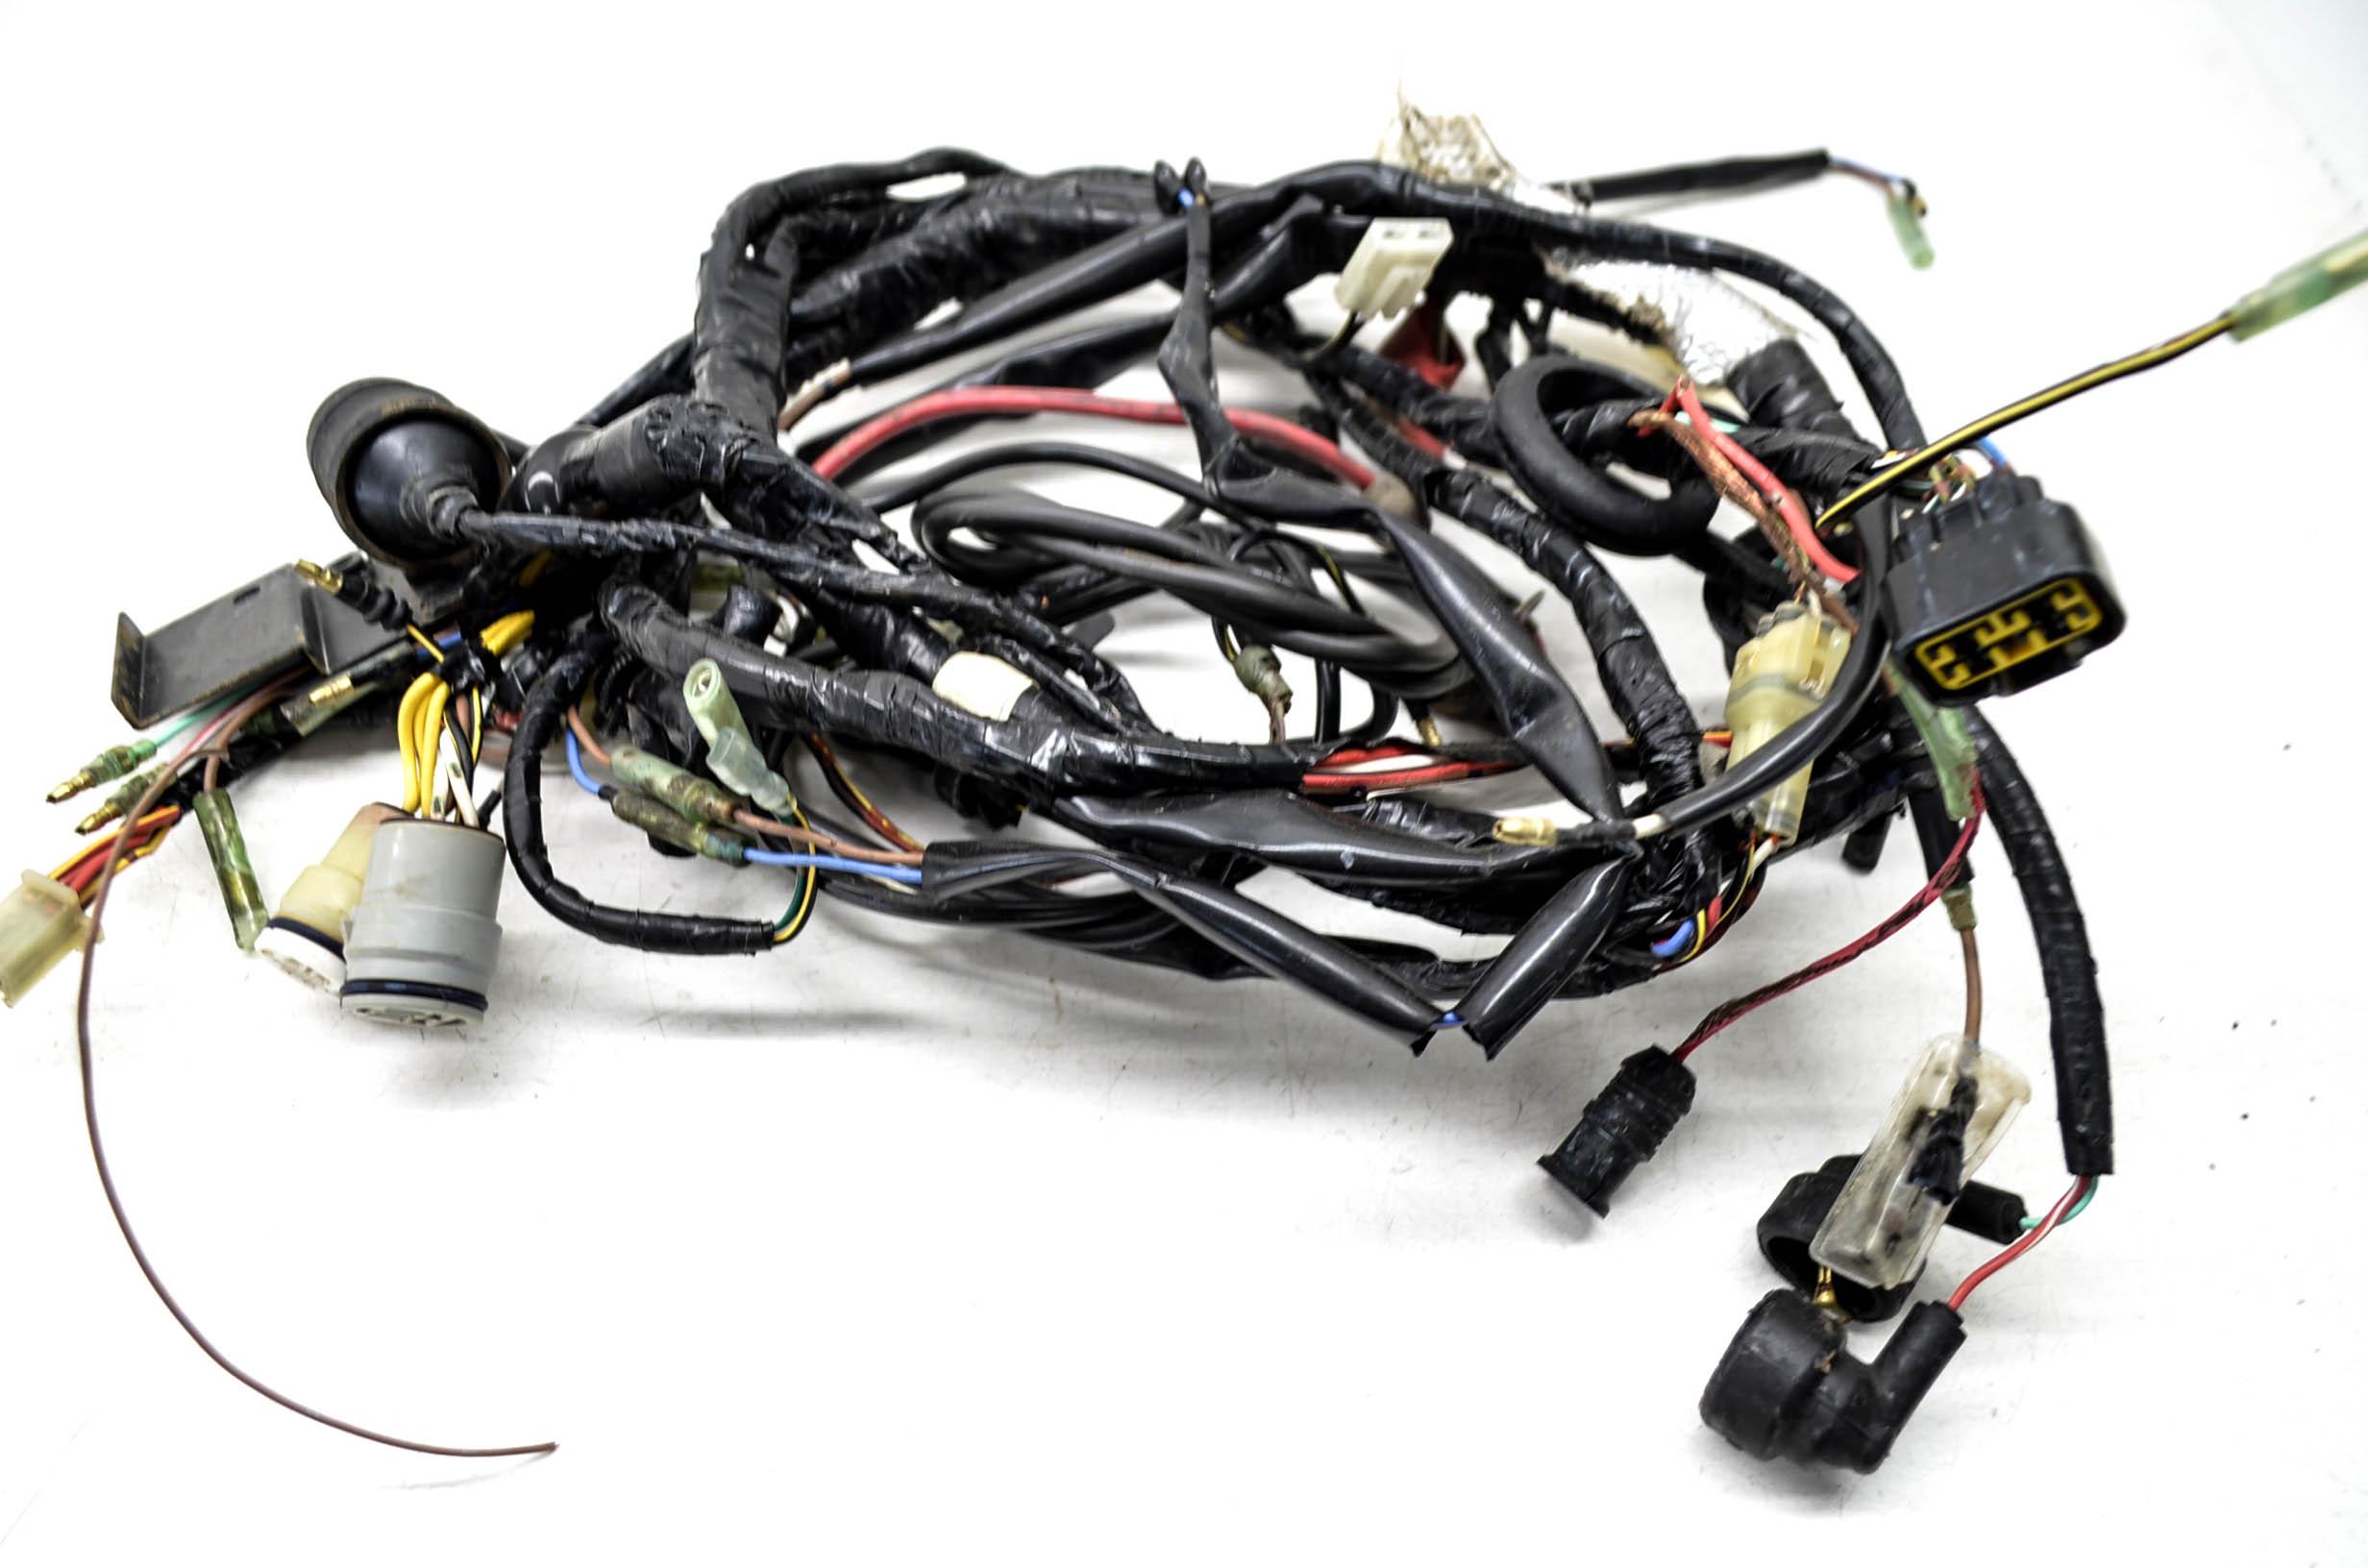 02 kawasaki prairie 300 4x4 wire harness electrical wiring kvf300a rh ebay com Ford Wiring Harness Kits Engine Wiring Harness